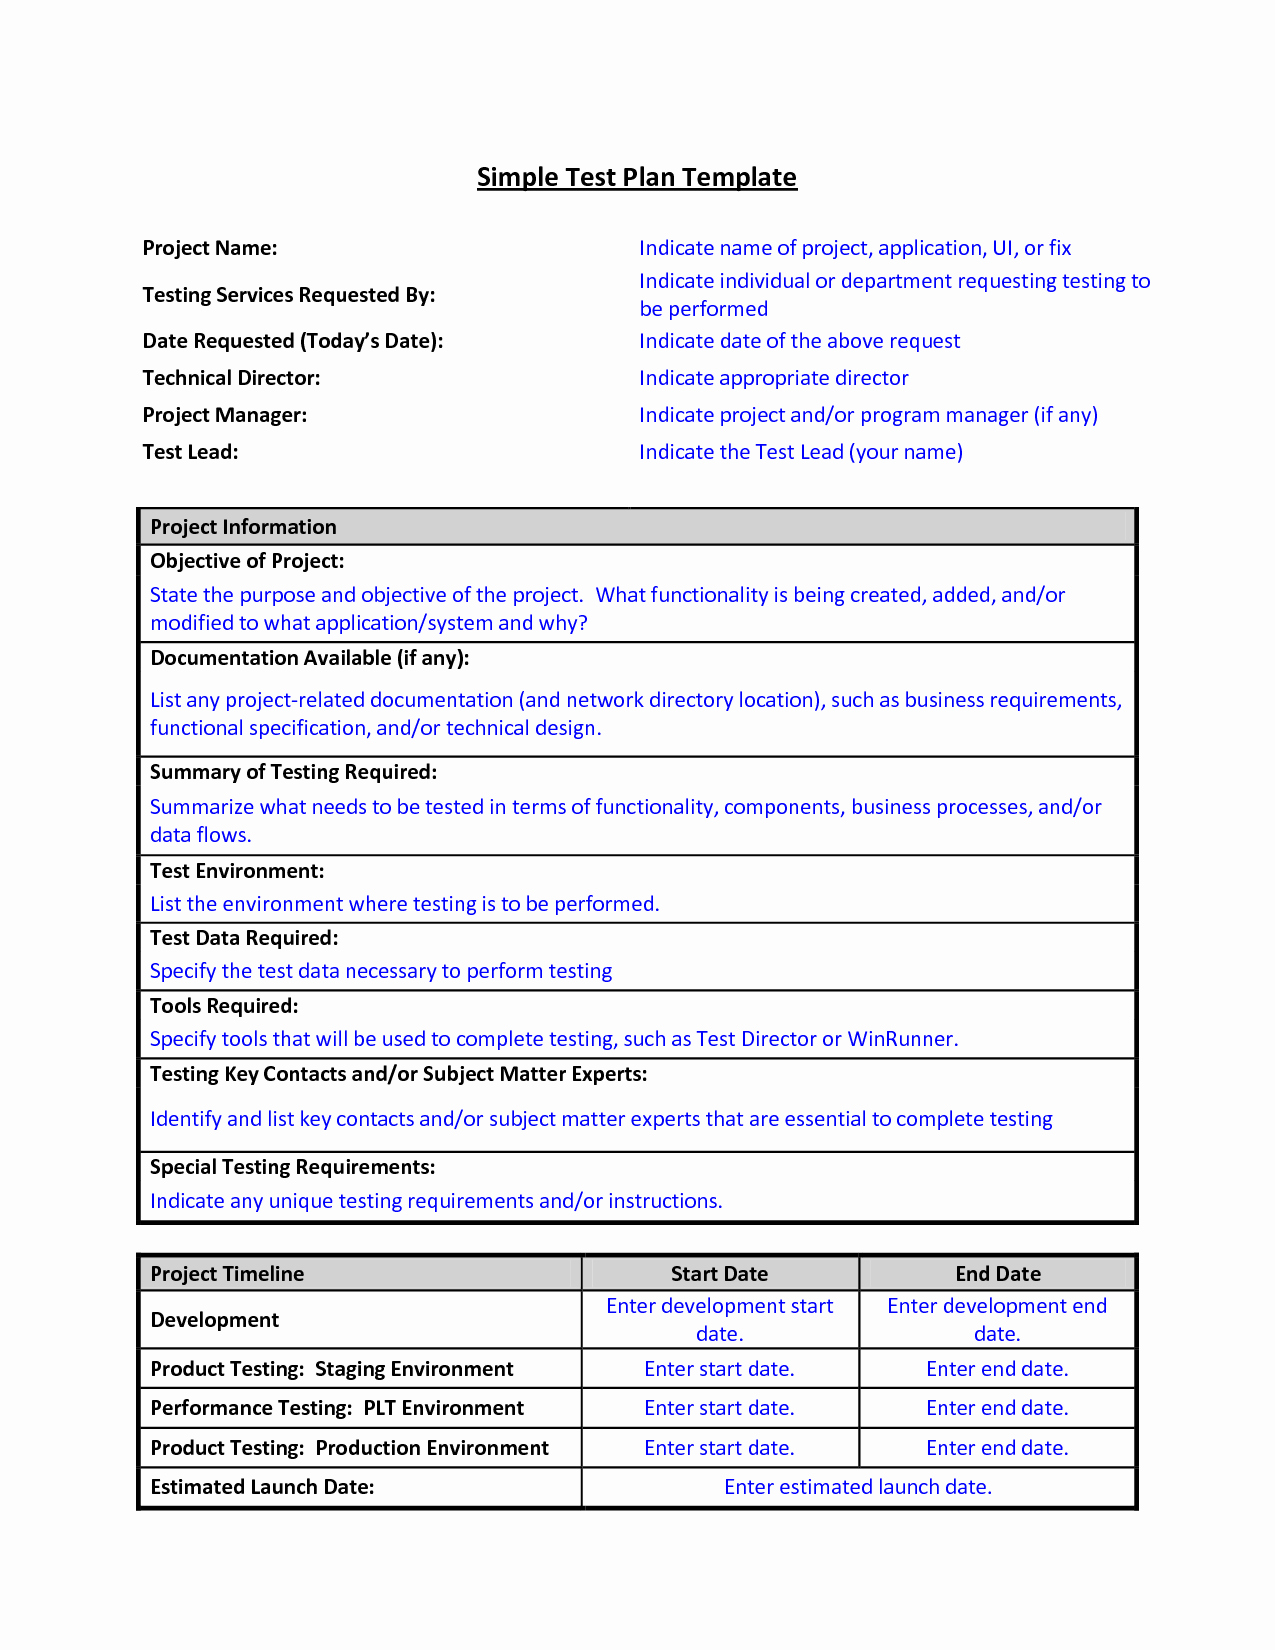 Test Plan Template Word Beautiful Test Plan Template format Sample Work Word Simple